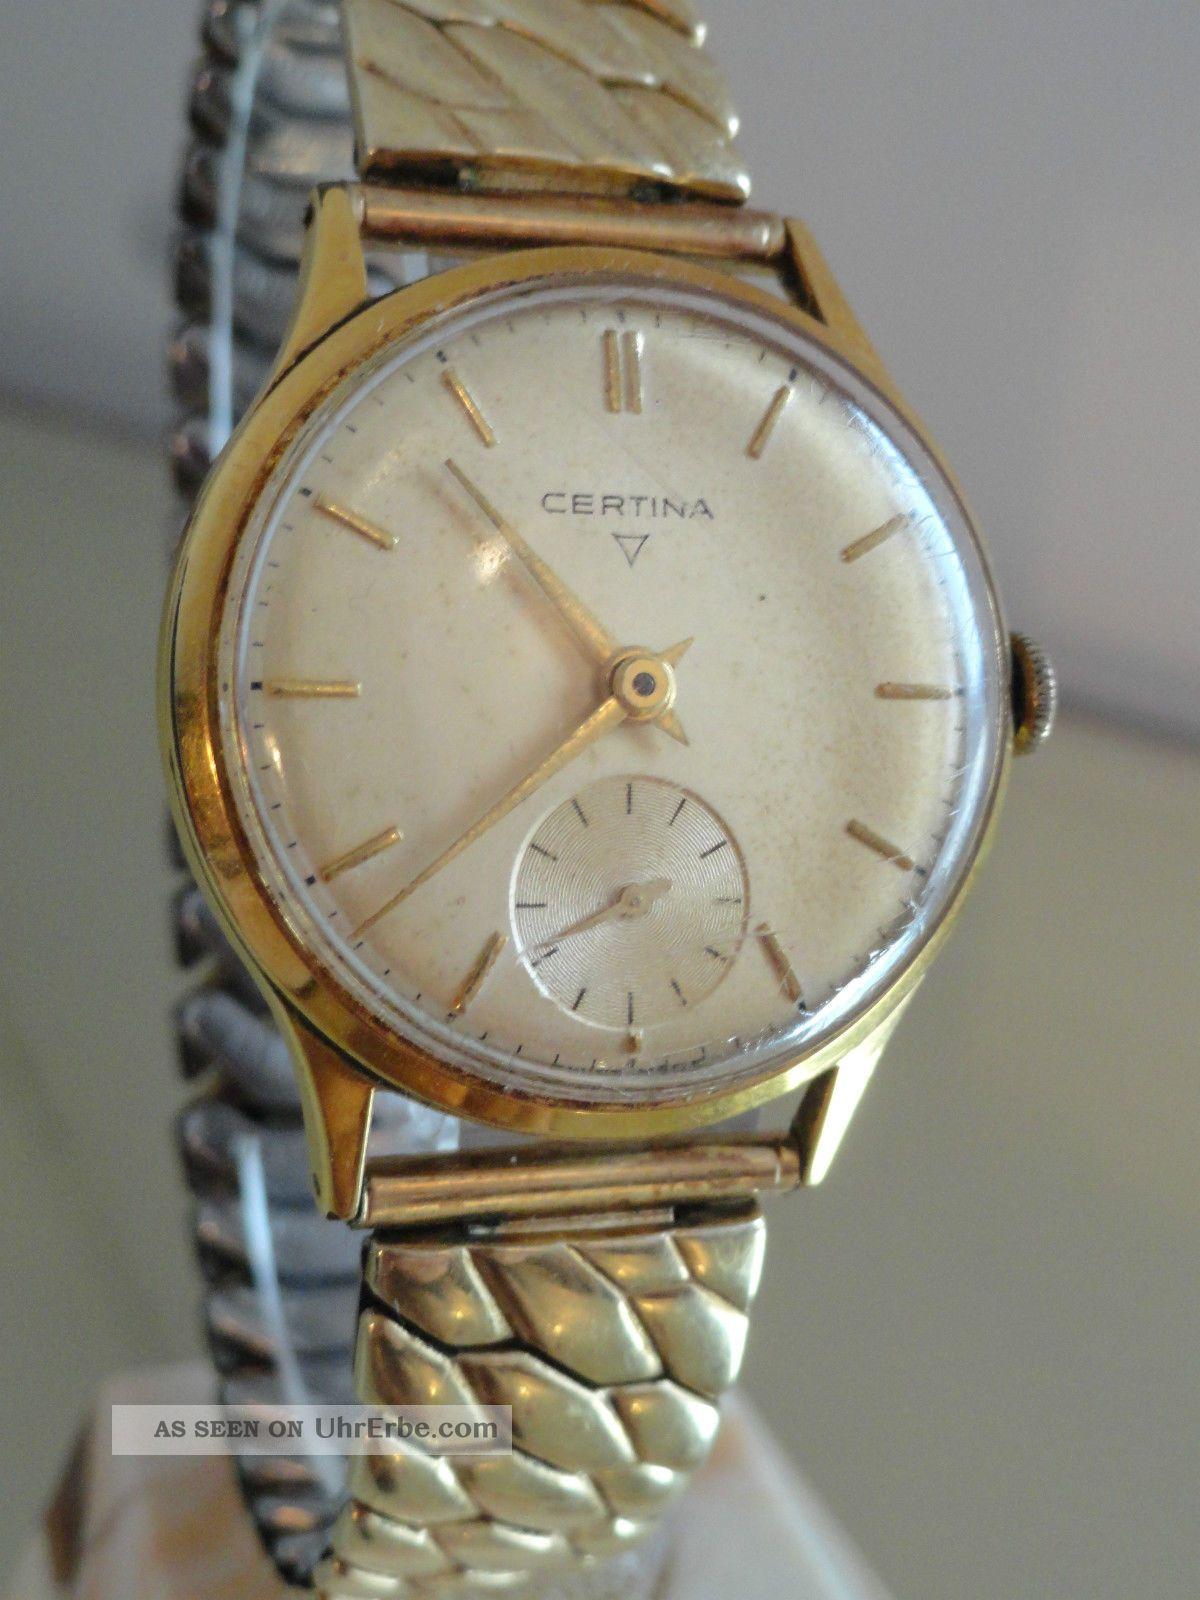 Seltene Certina Armbanduhr,  Mechanisch Armbanduhren Bild